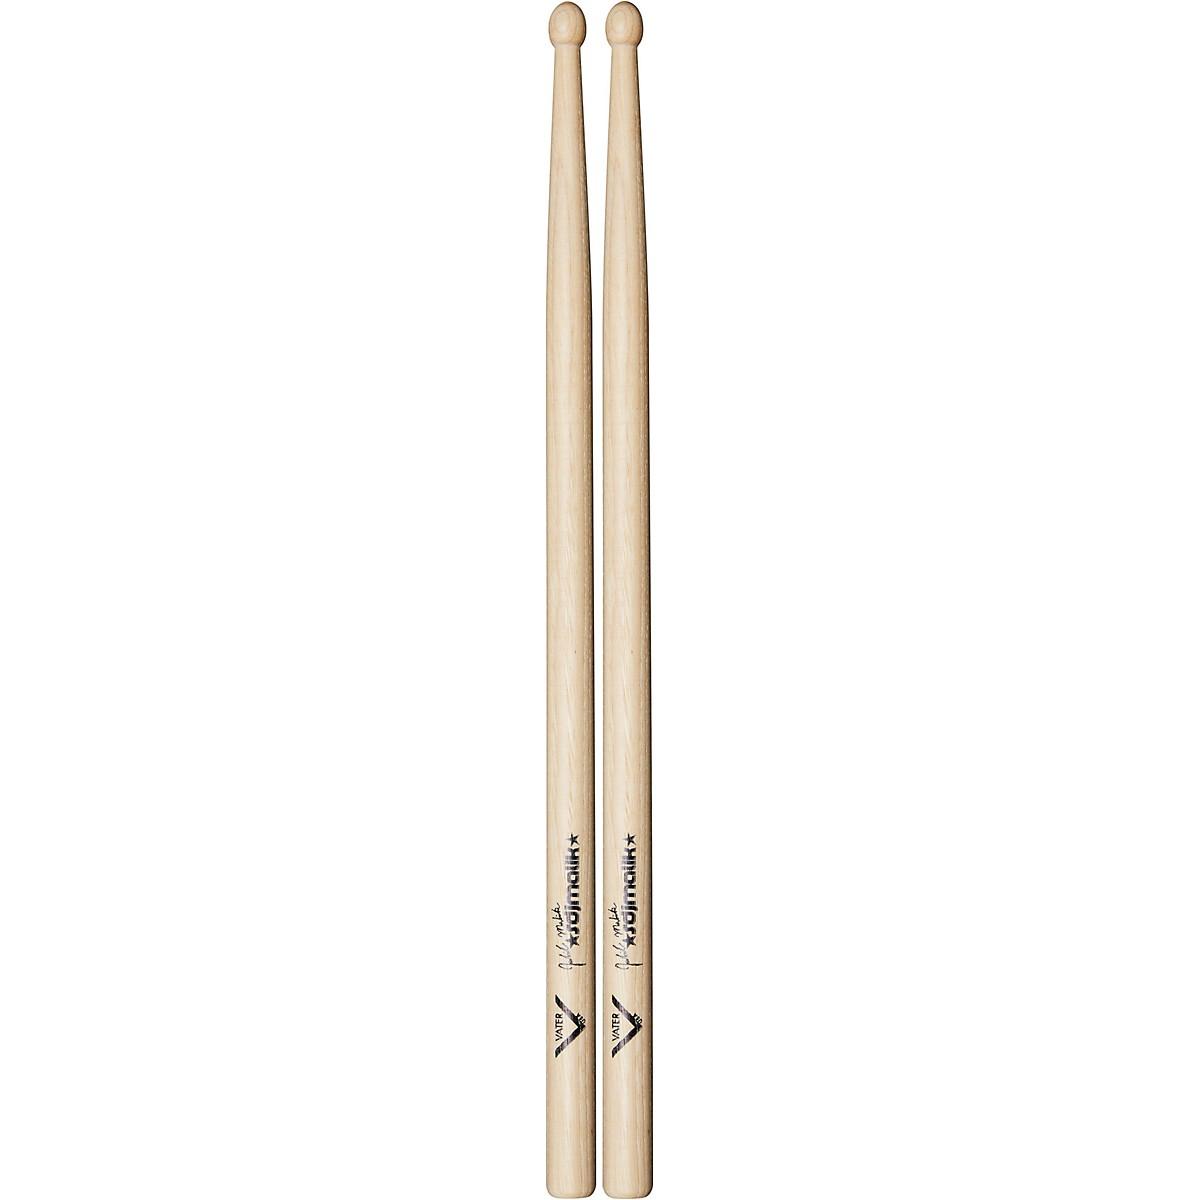 Vater SDJ Malik Model Marching Snare Drum Sticks